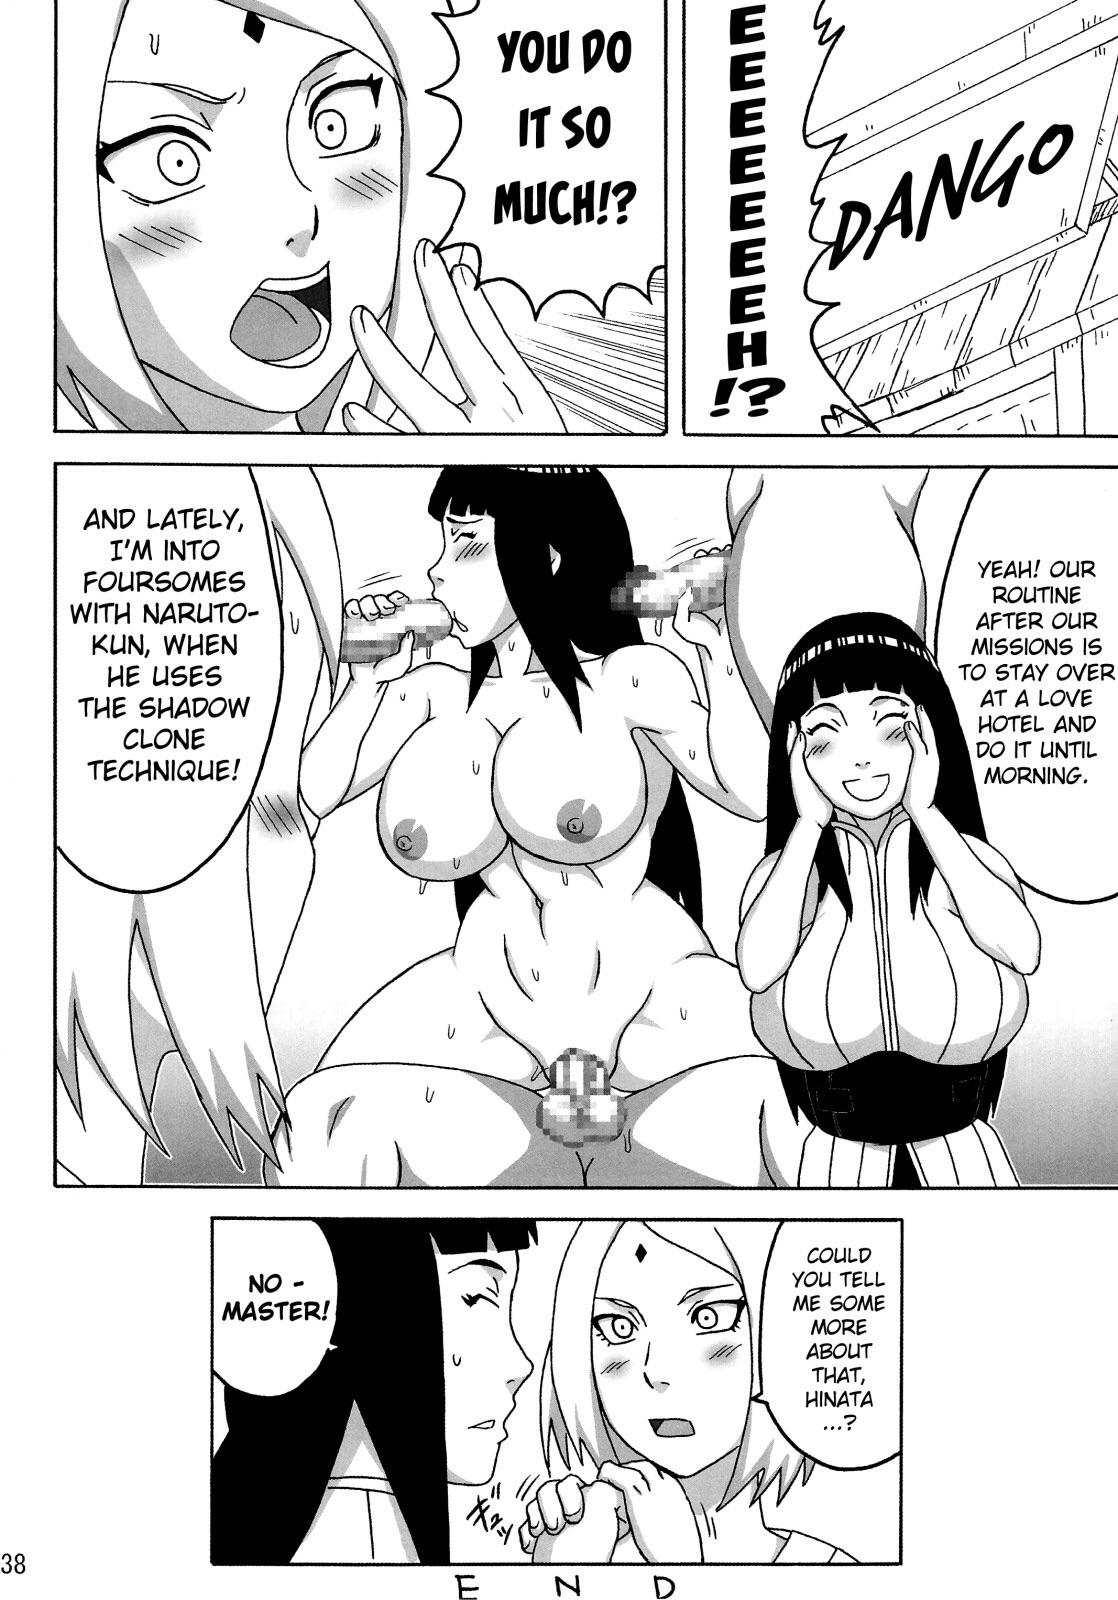 Naruhina hentai